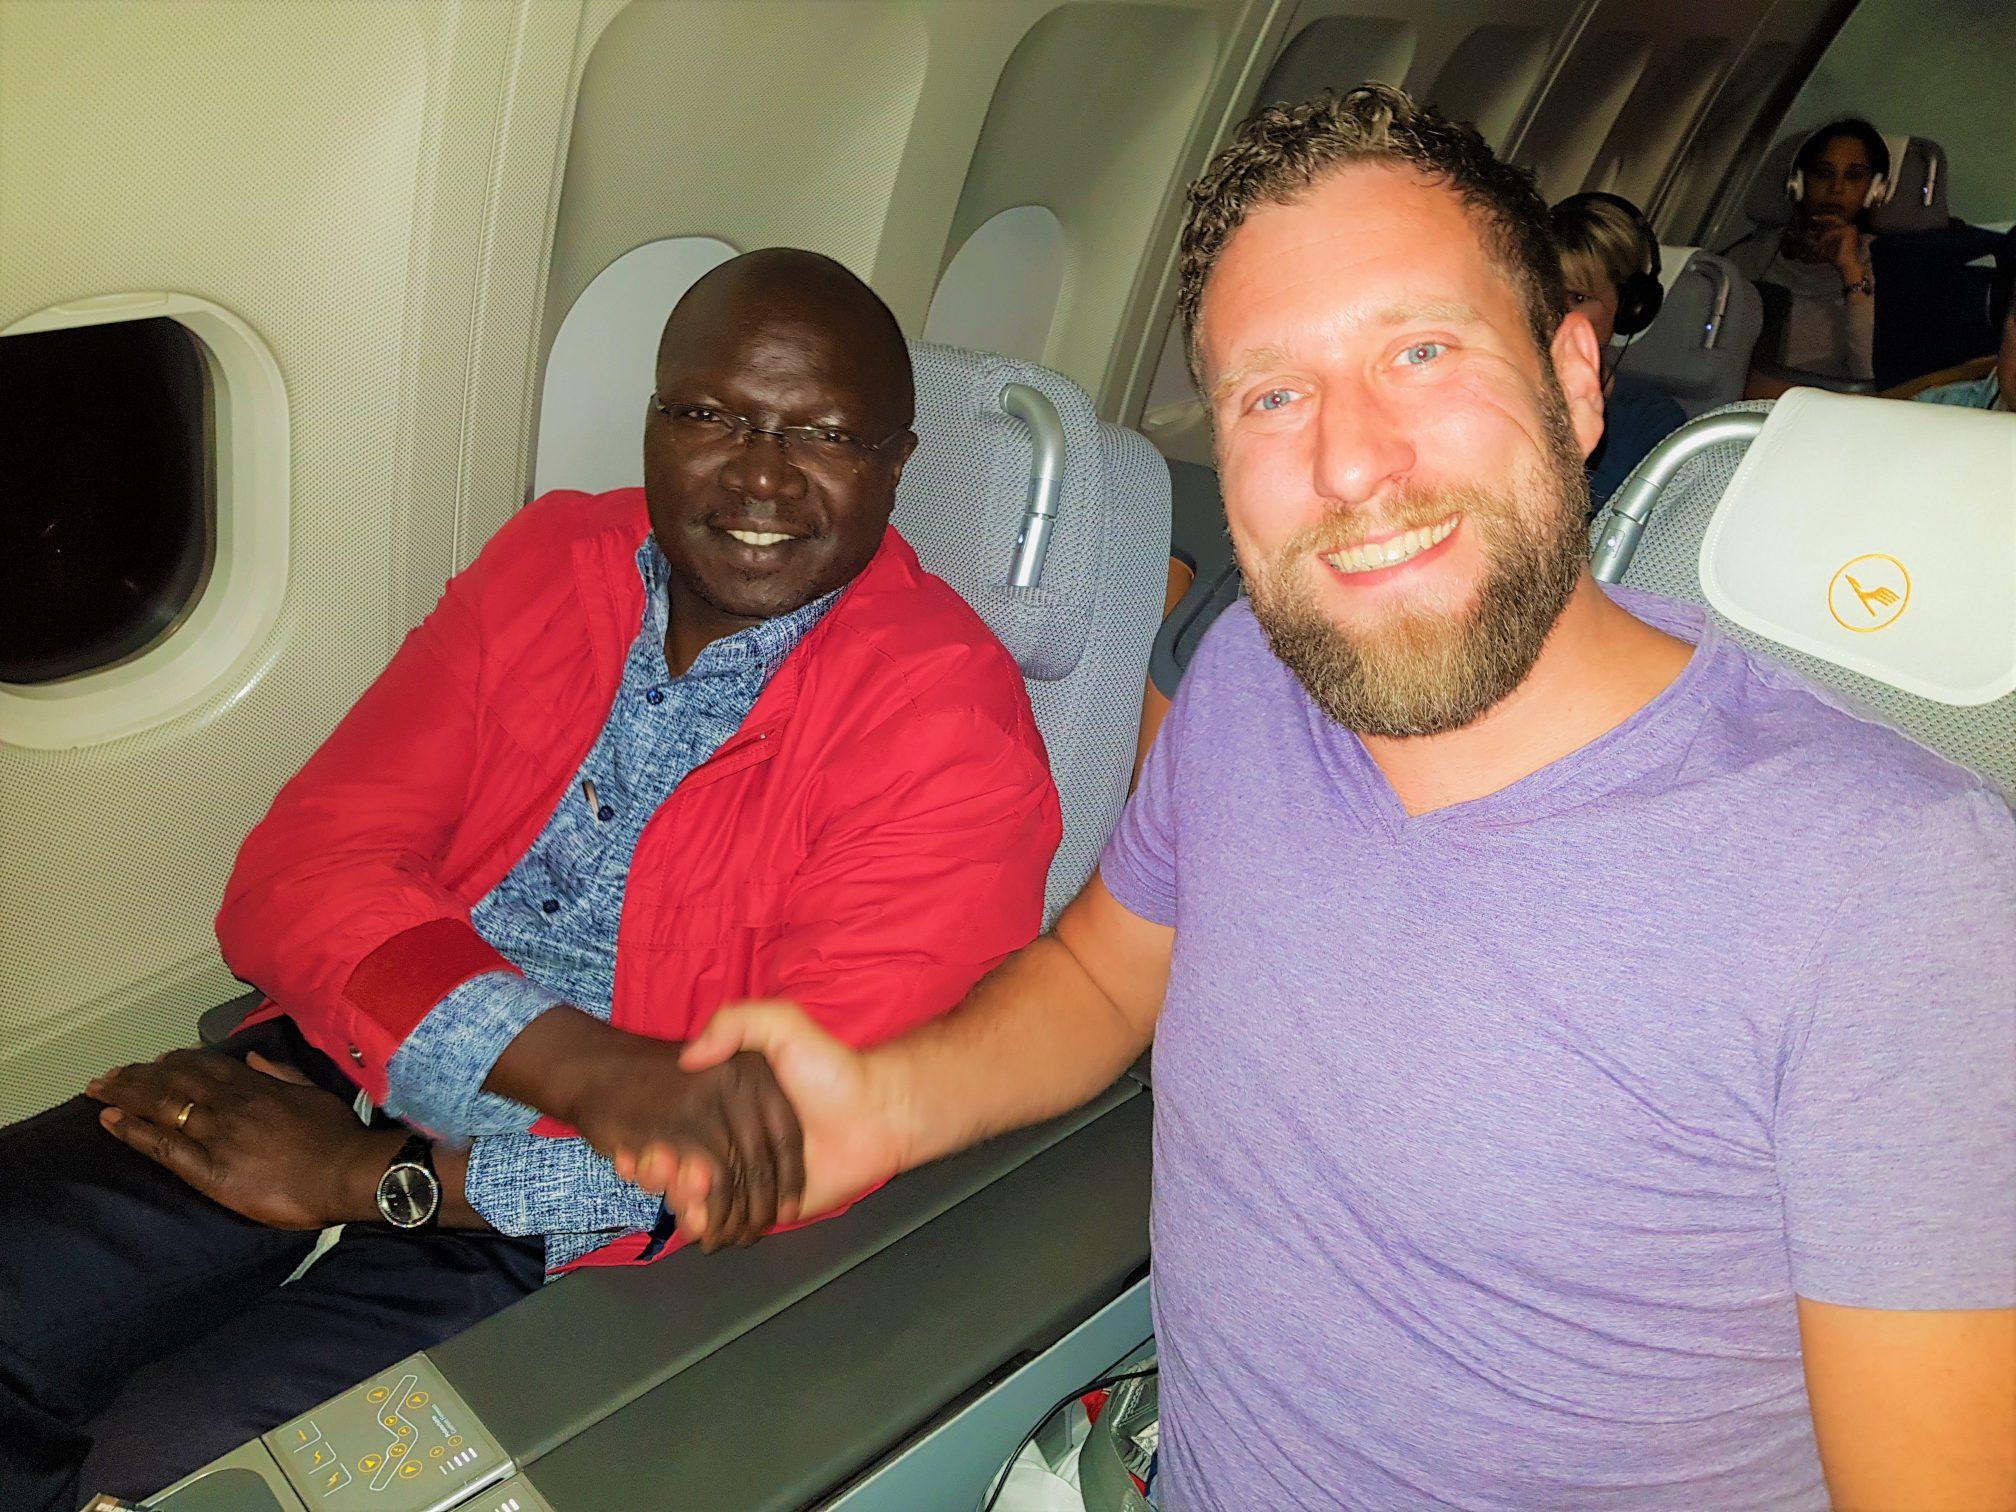 Thomas Festerling, GreenTec CFO and His Honor Simon Kiprono Khelugui, Kenya's Minister for Water and Sanitation